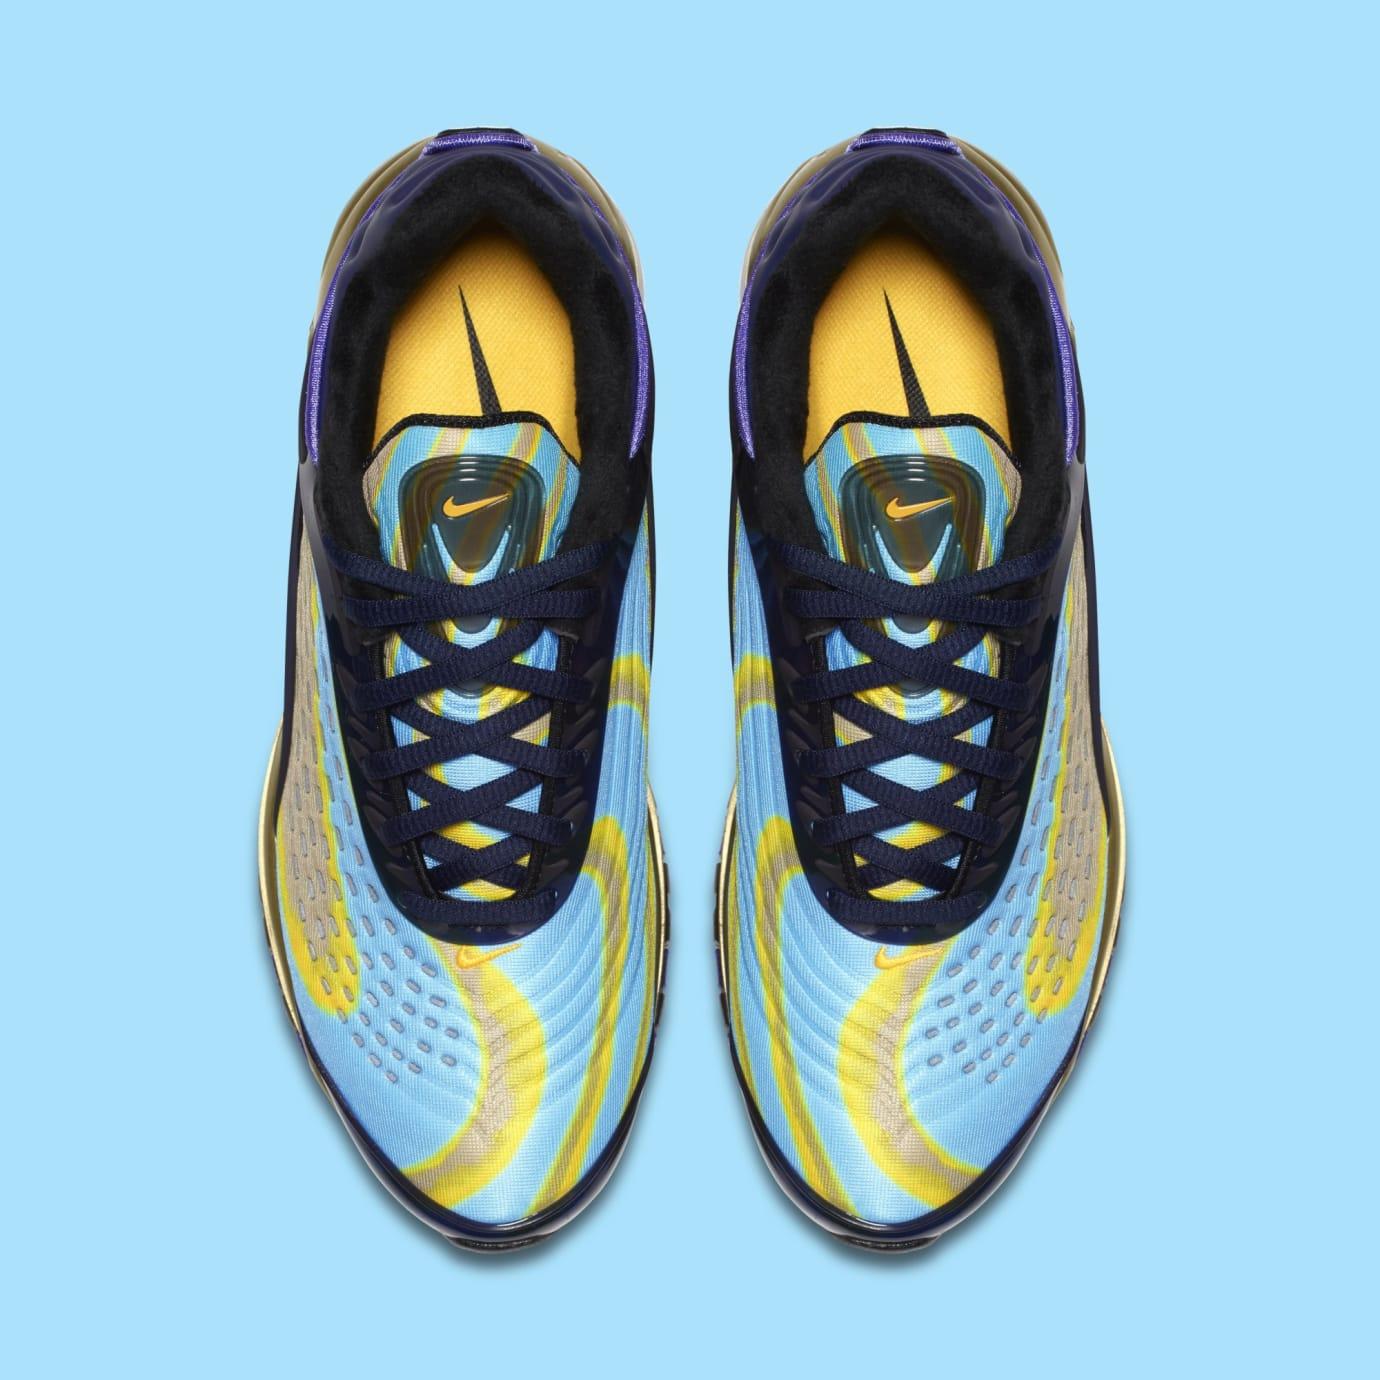 Nike Air Max Deluxe 'Midnight Navy/Laser Orange' AQ1272-400 (Top)